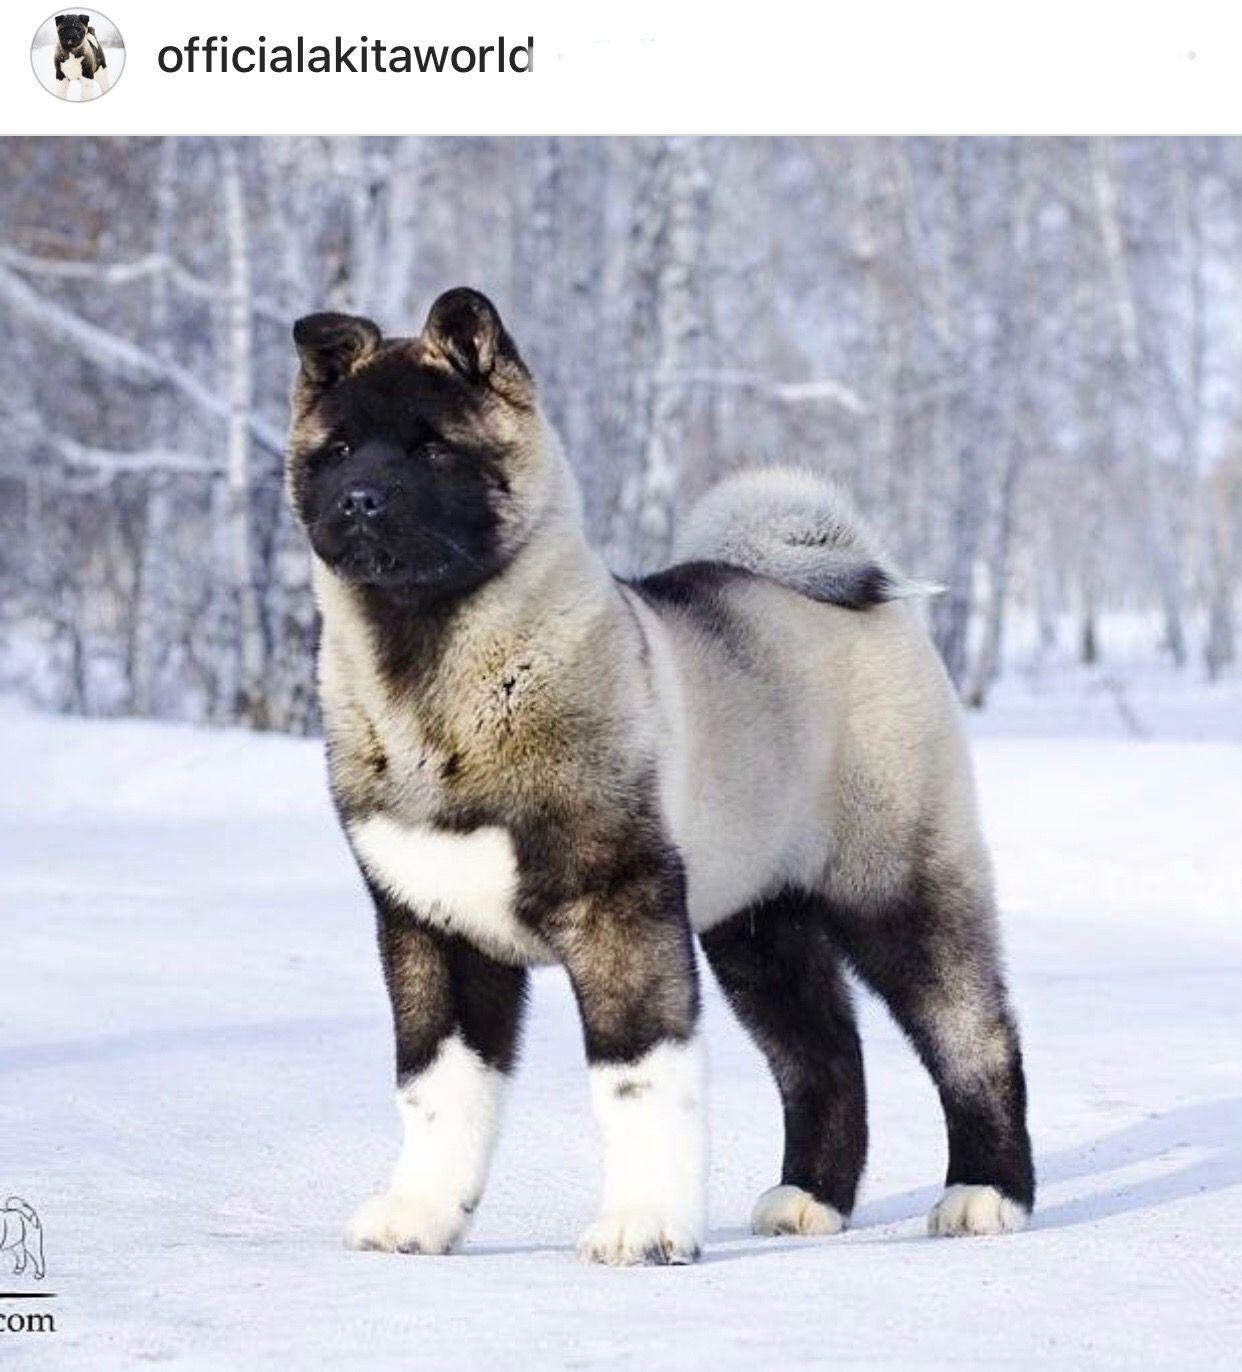 Pin By Steven Kuhlmann On Do You Like Dags Yea I Like Dogs